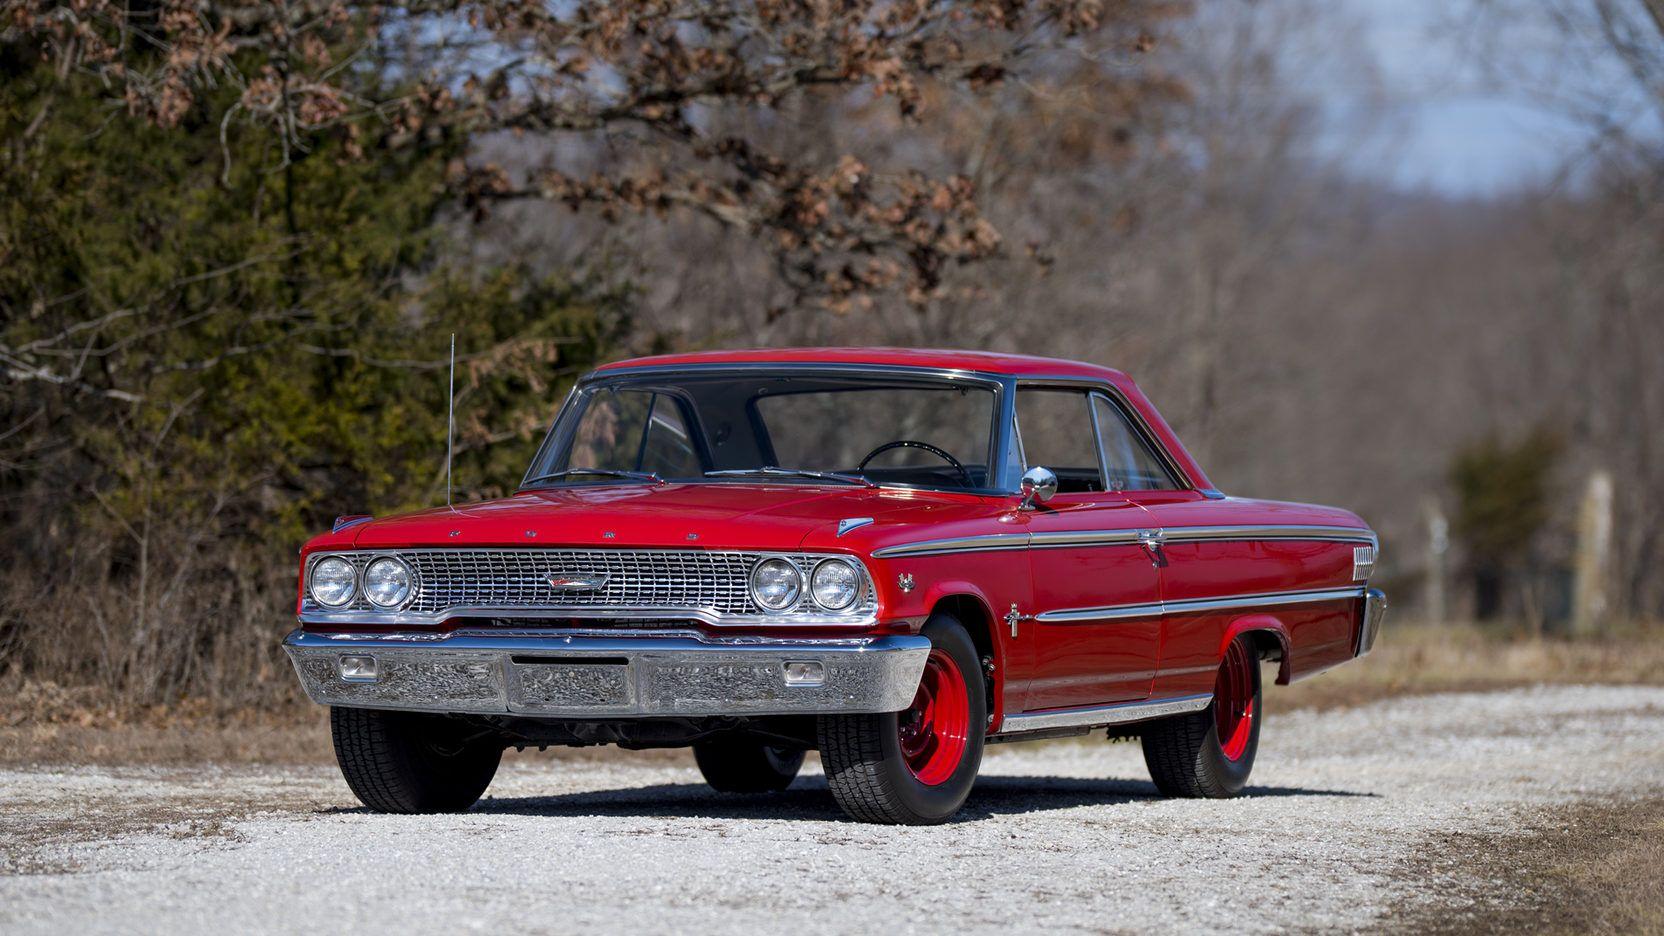 Lot S106: 1963 Ford Galaxie 500 #WhereTheCarsAre #Mecum #KC